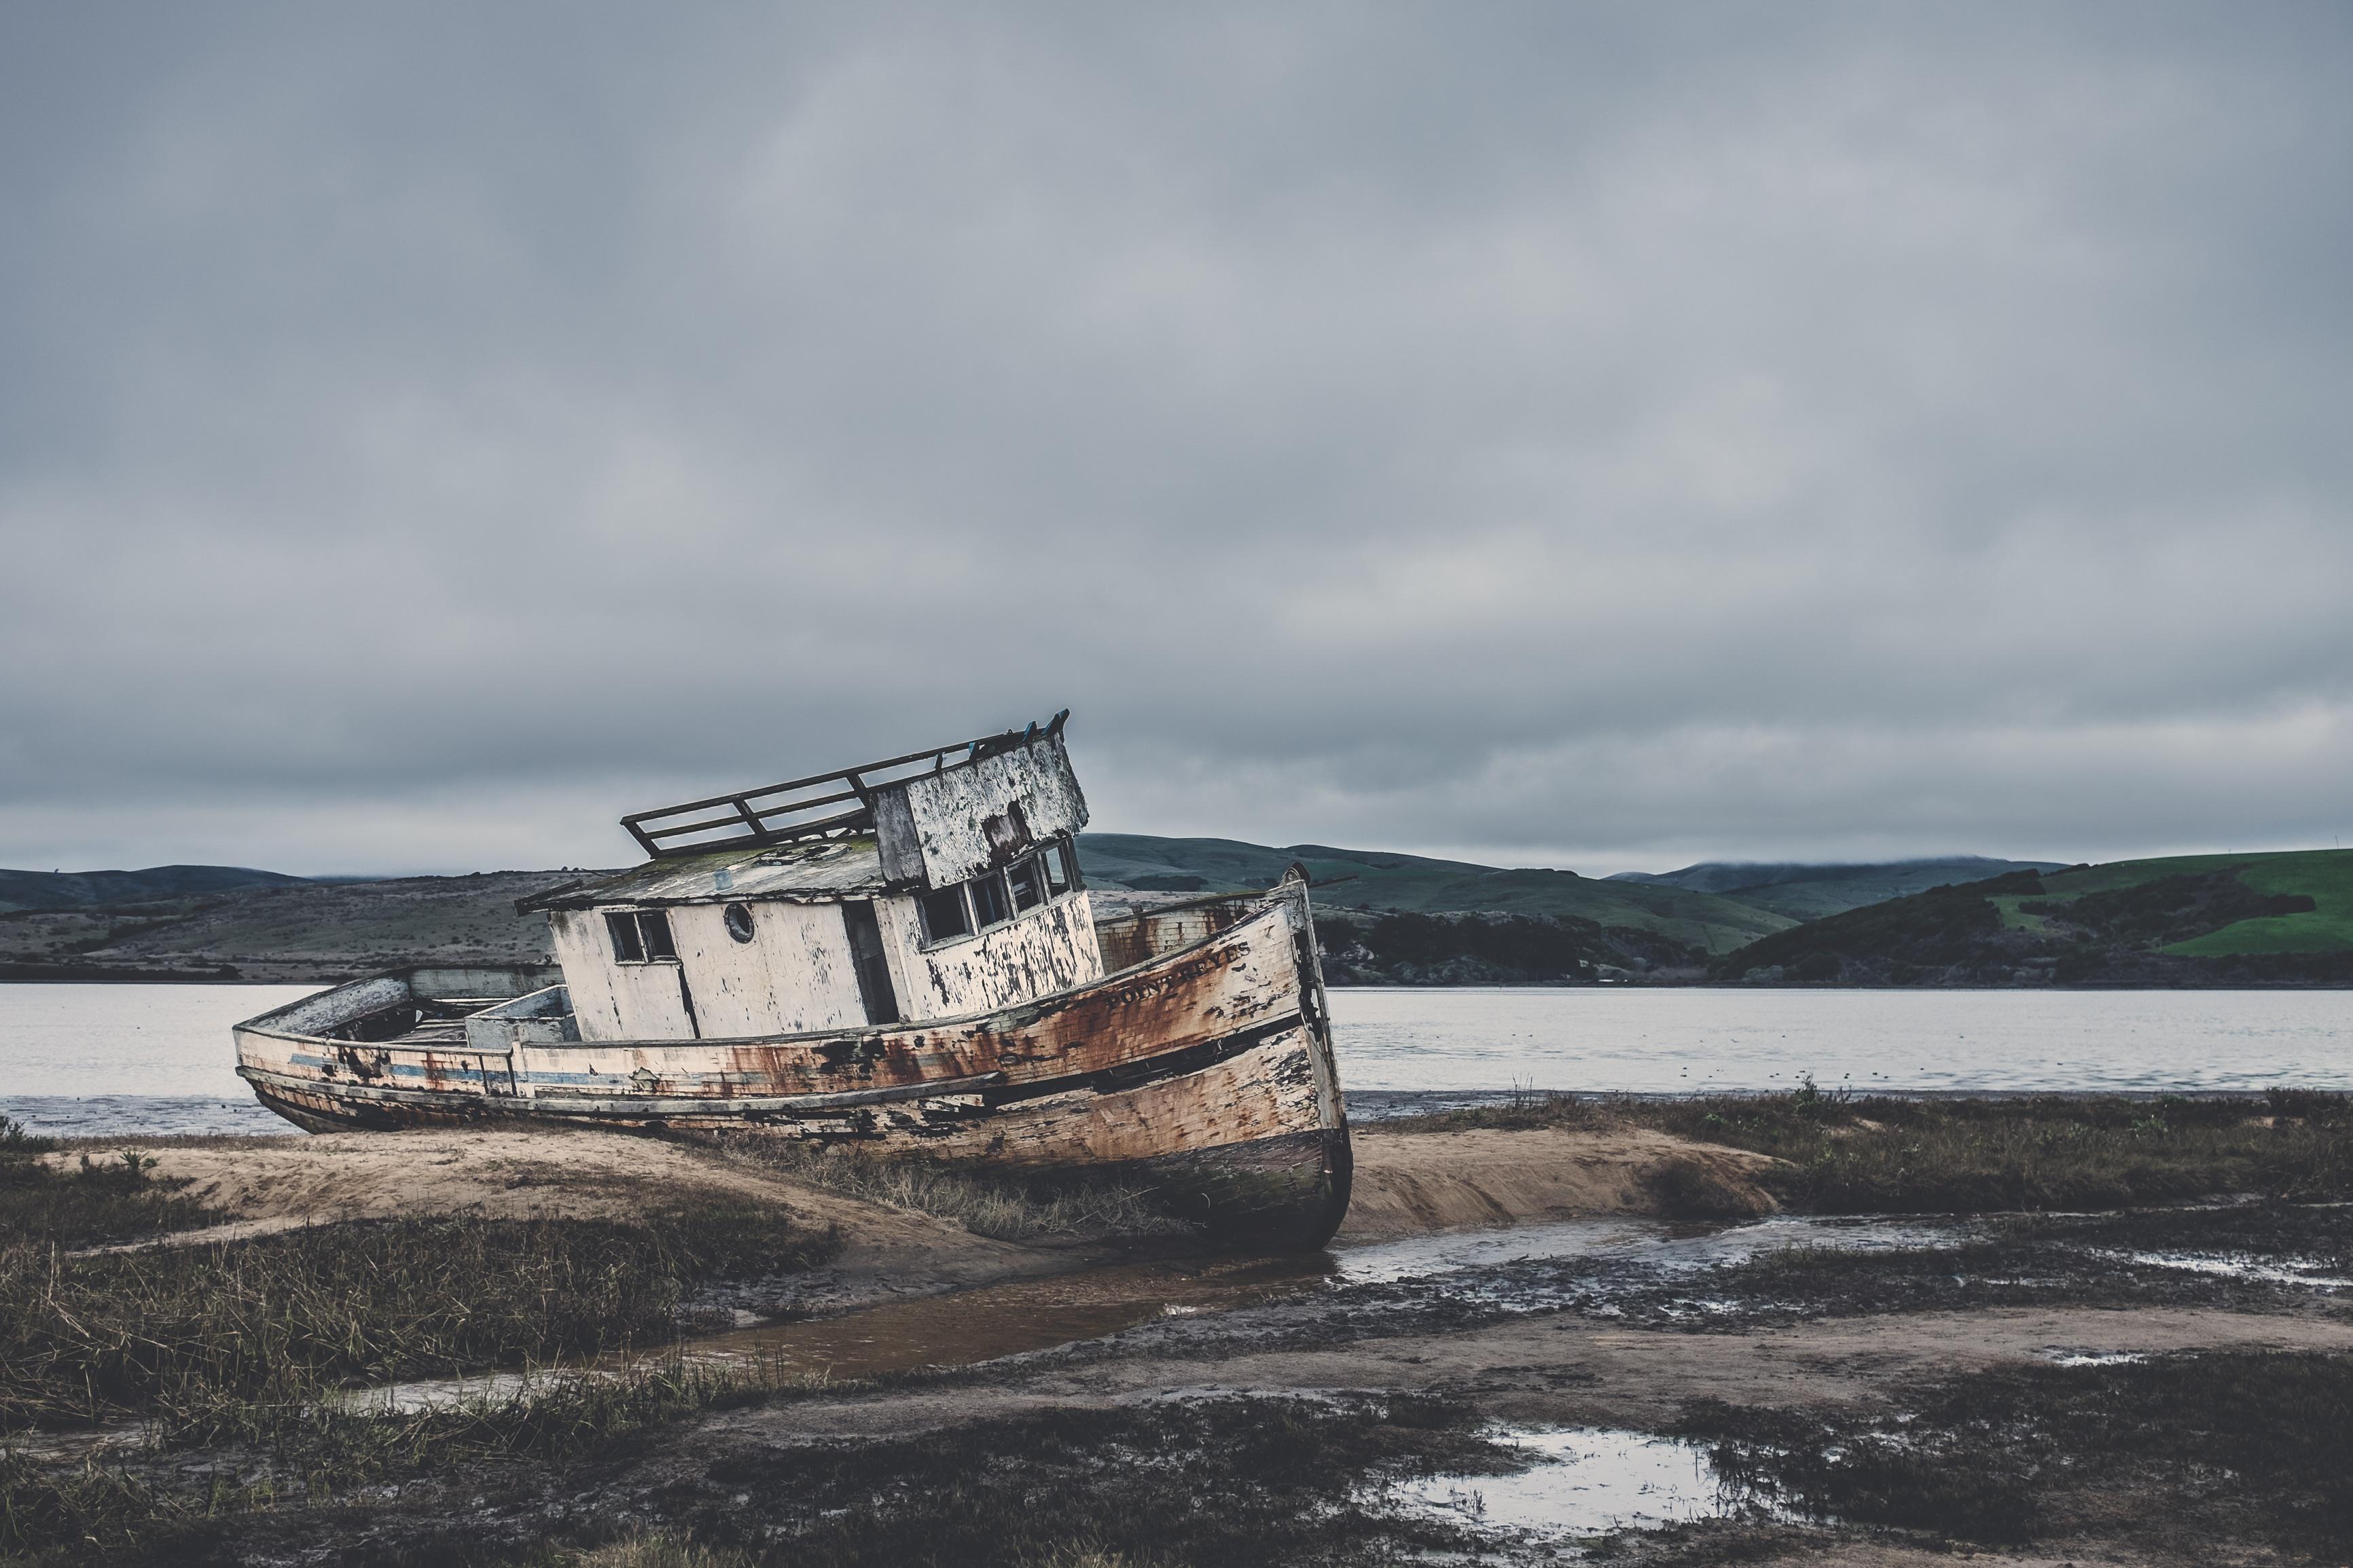 Rust, Abandoned, Boat, Flow, Landscape, HQ Photo